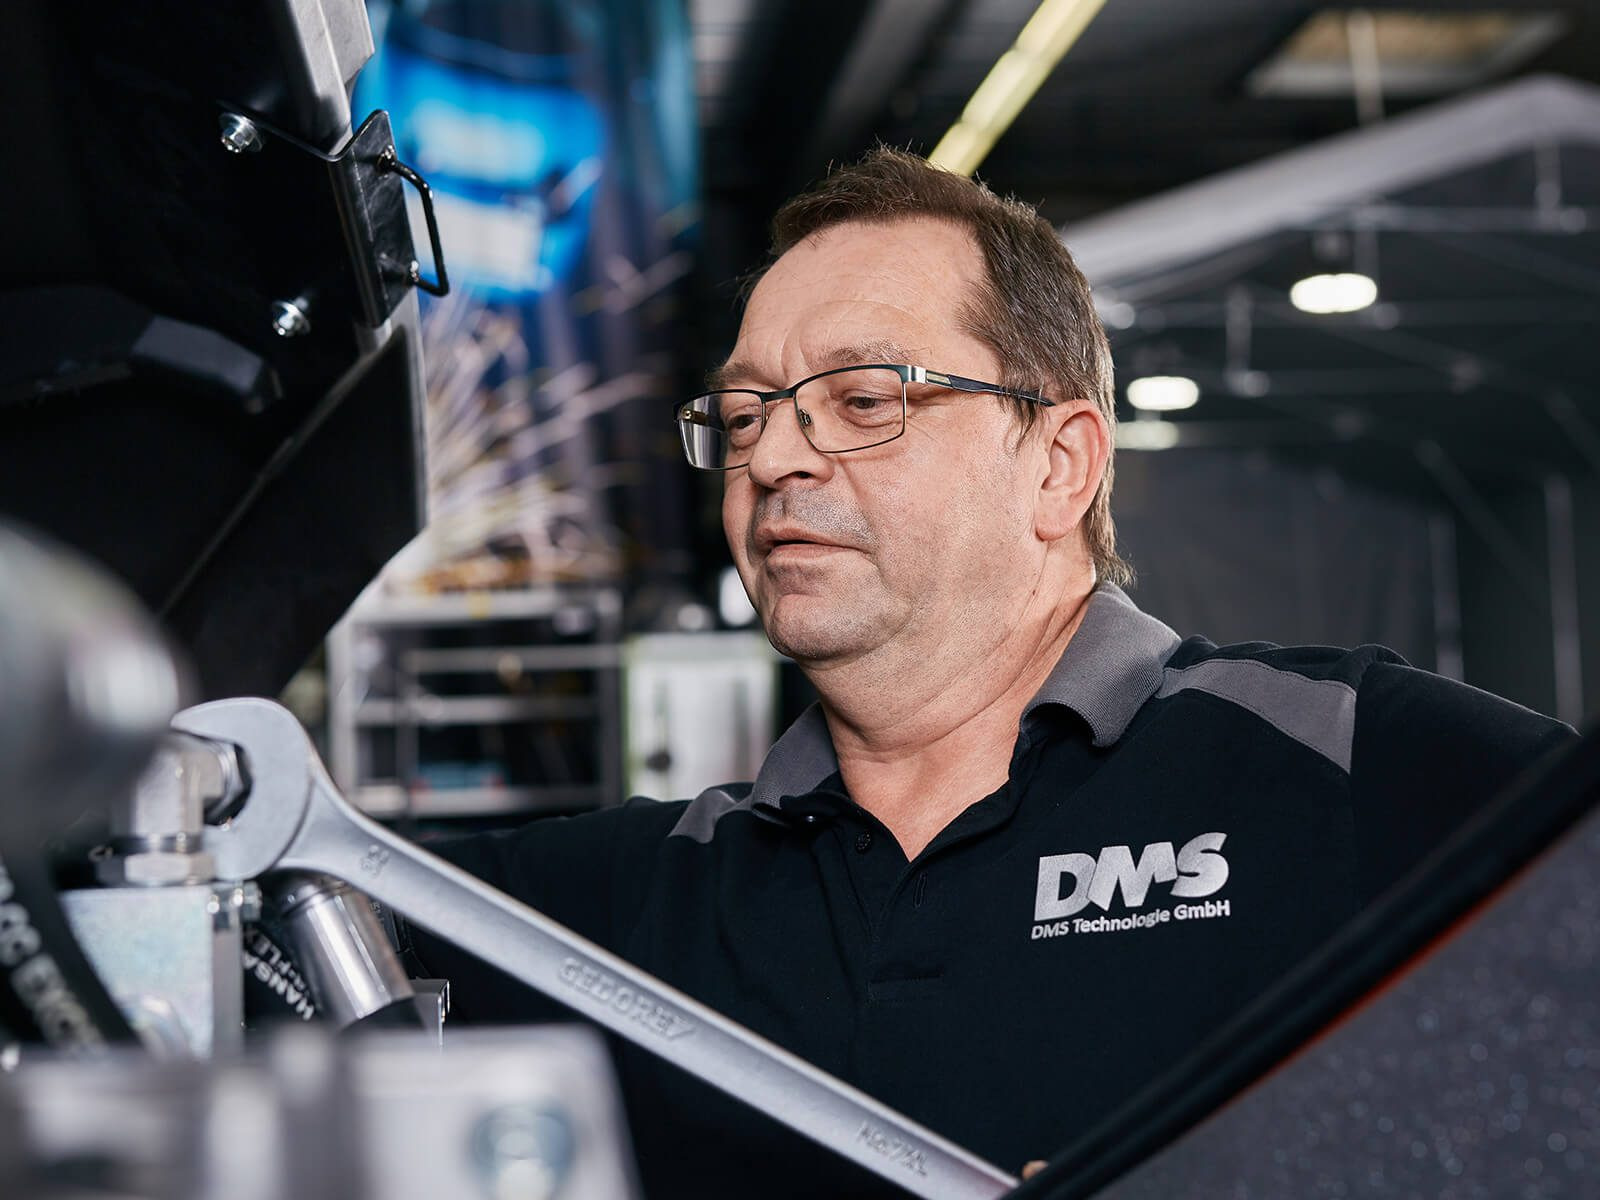 Veit Berg Entwicklung DMS Technologie